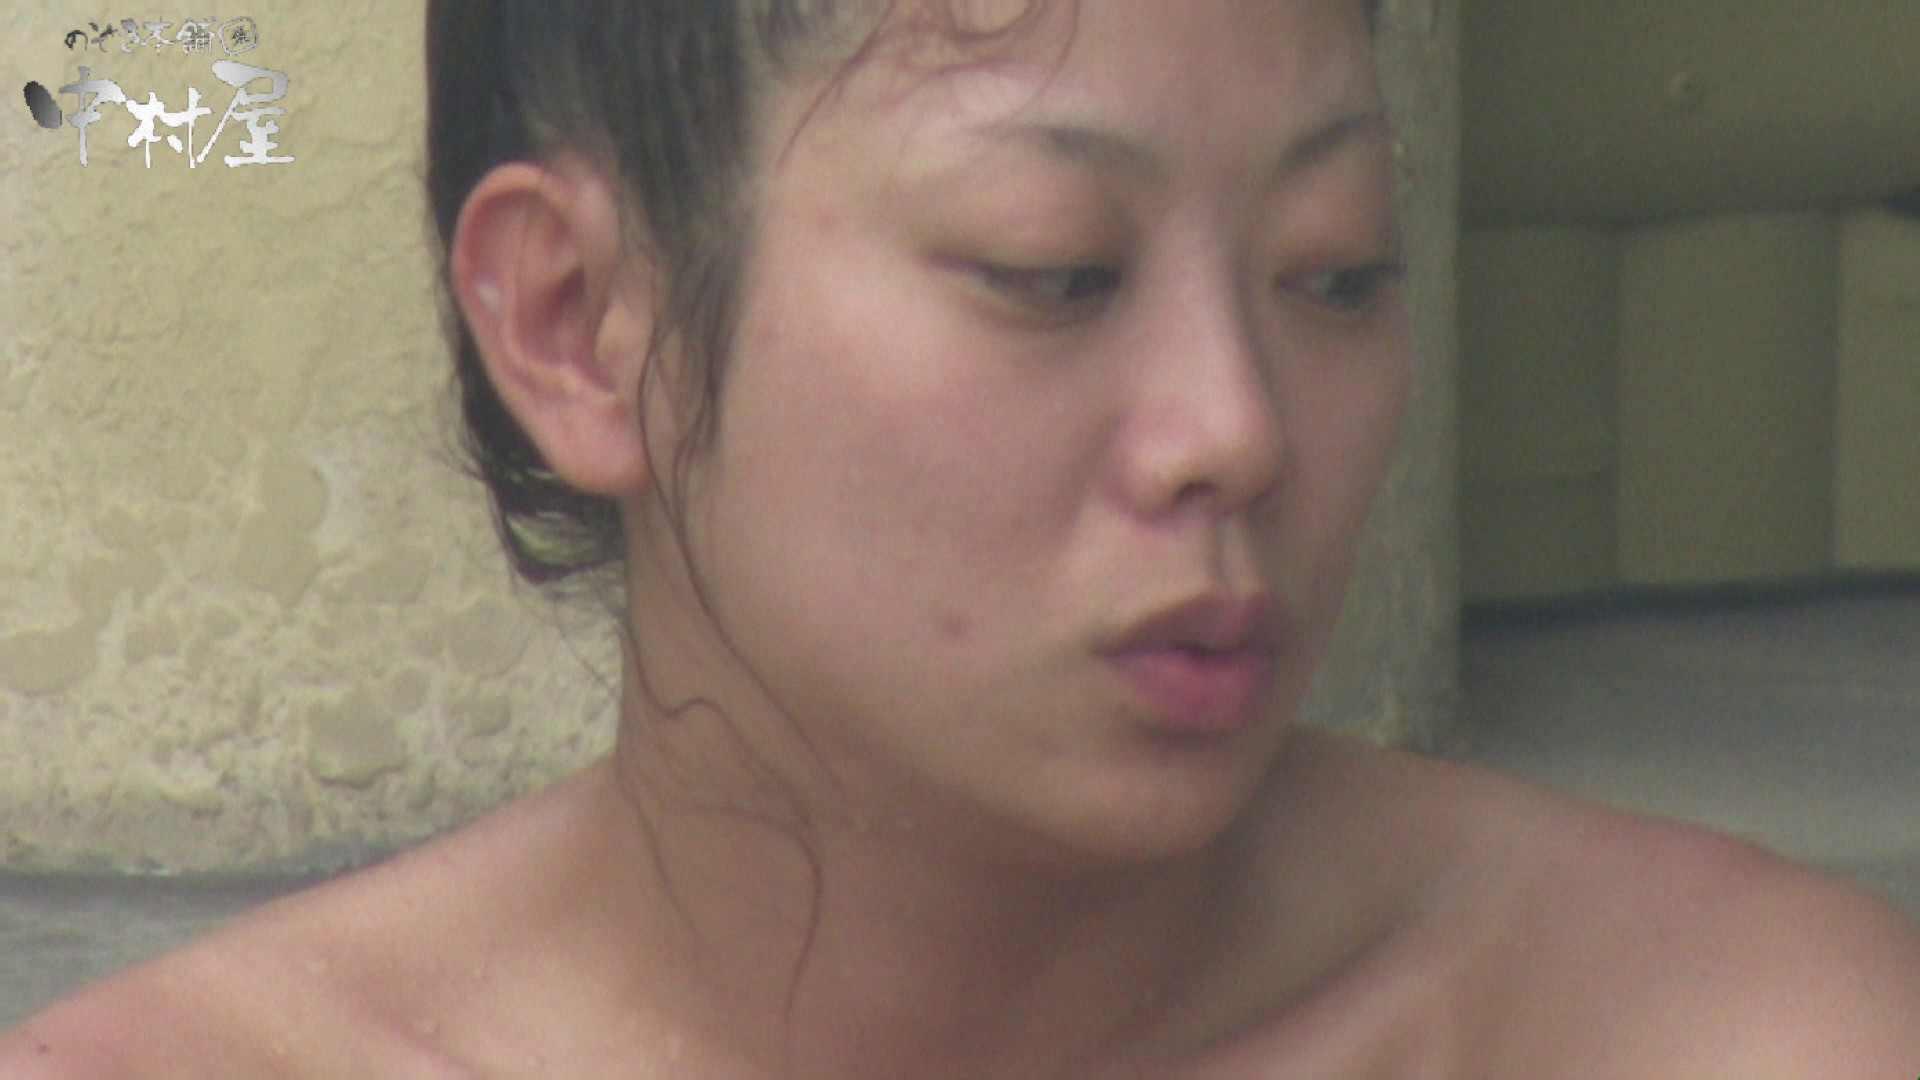 Aquaな露天風呂Vol.886 盗撮特撮  10pic 9